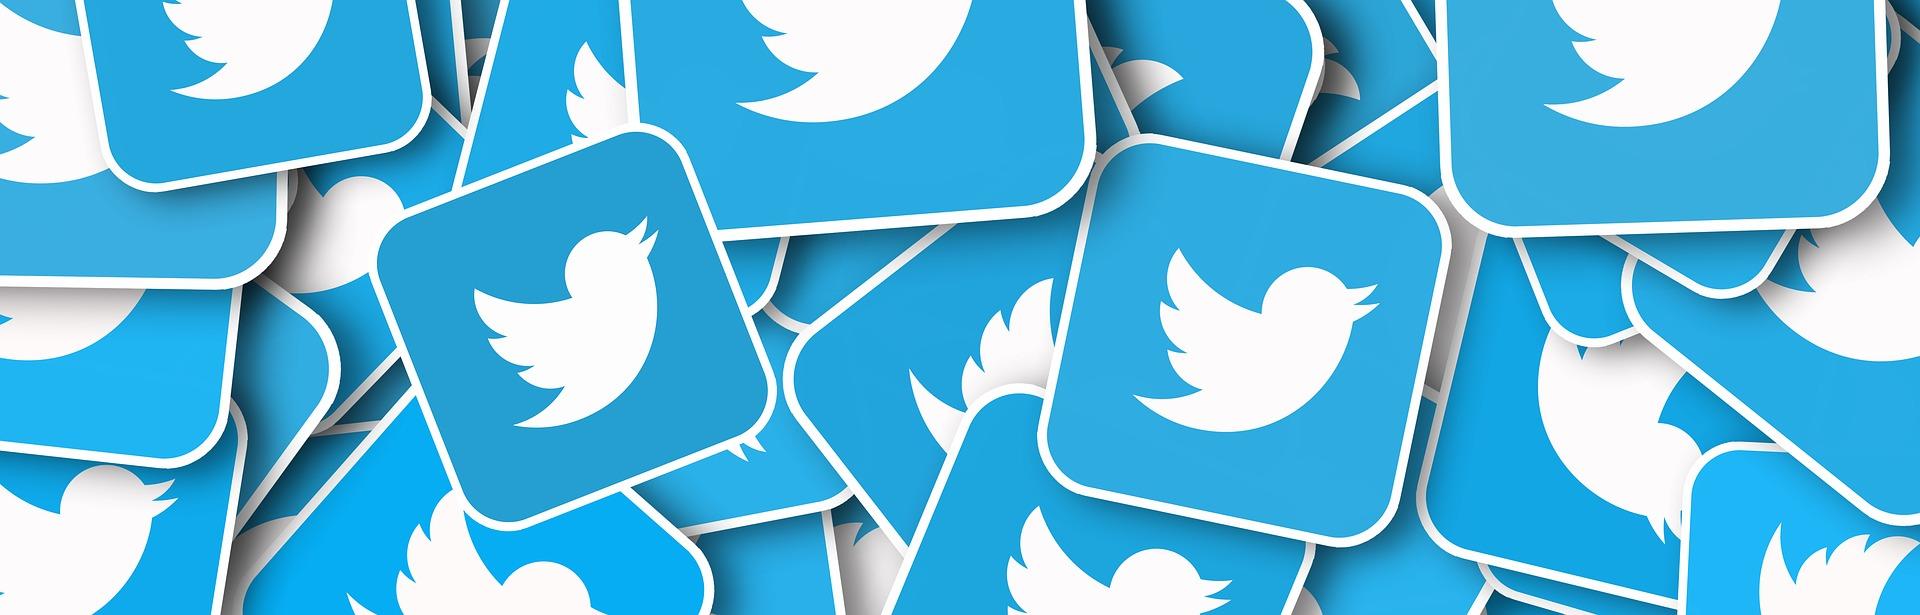 Twitter|